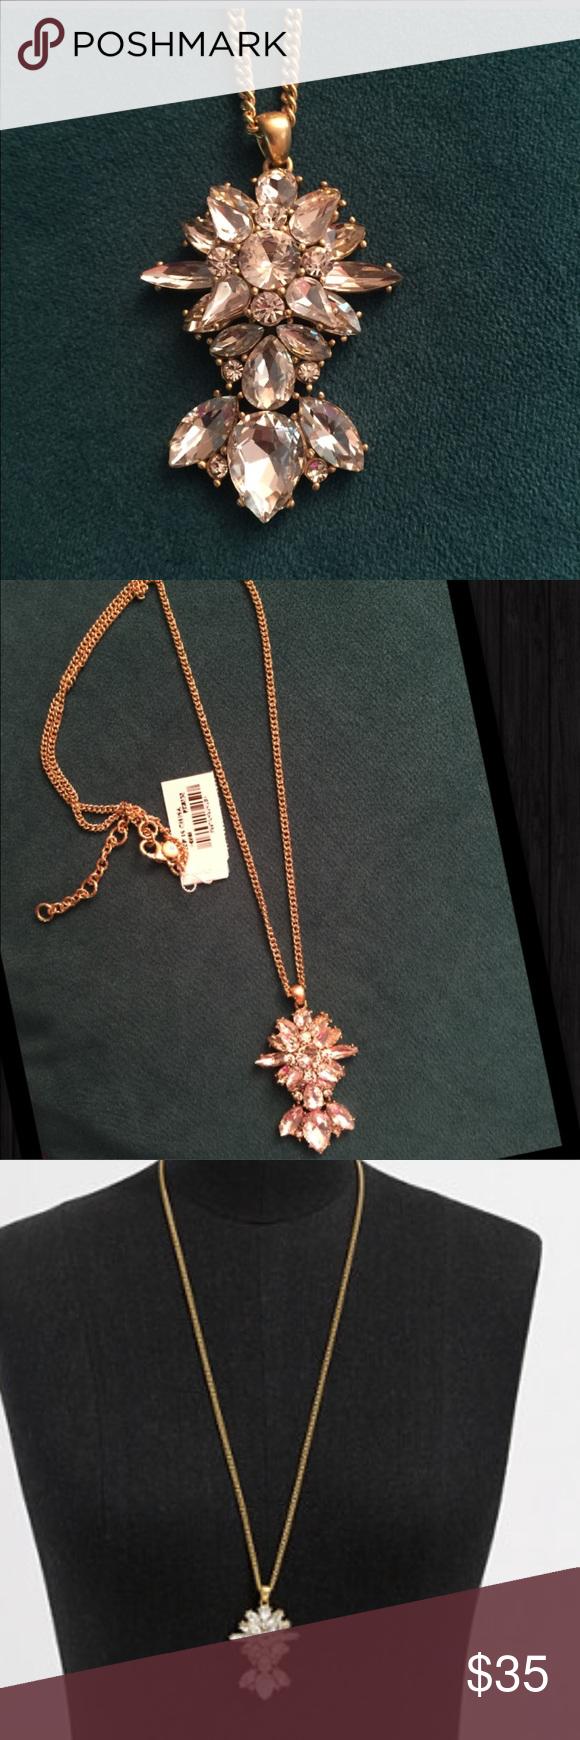 Jcrew stone icon pendant necklace nwt